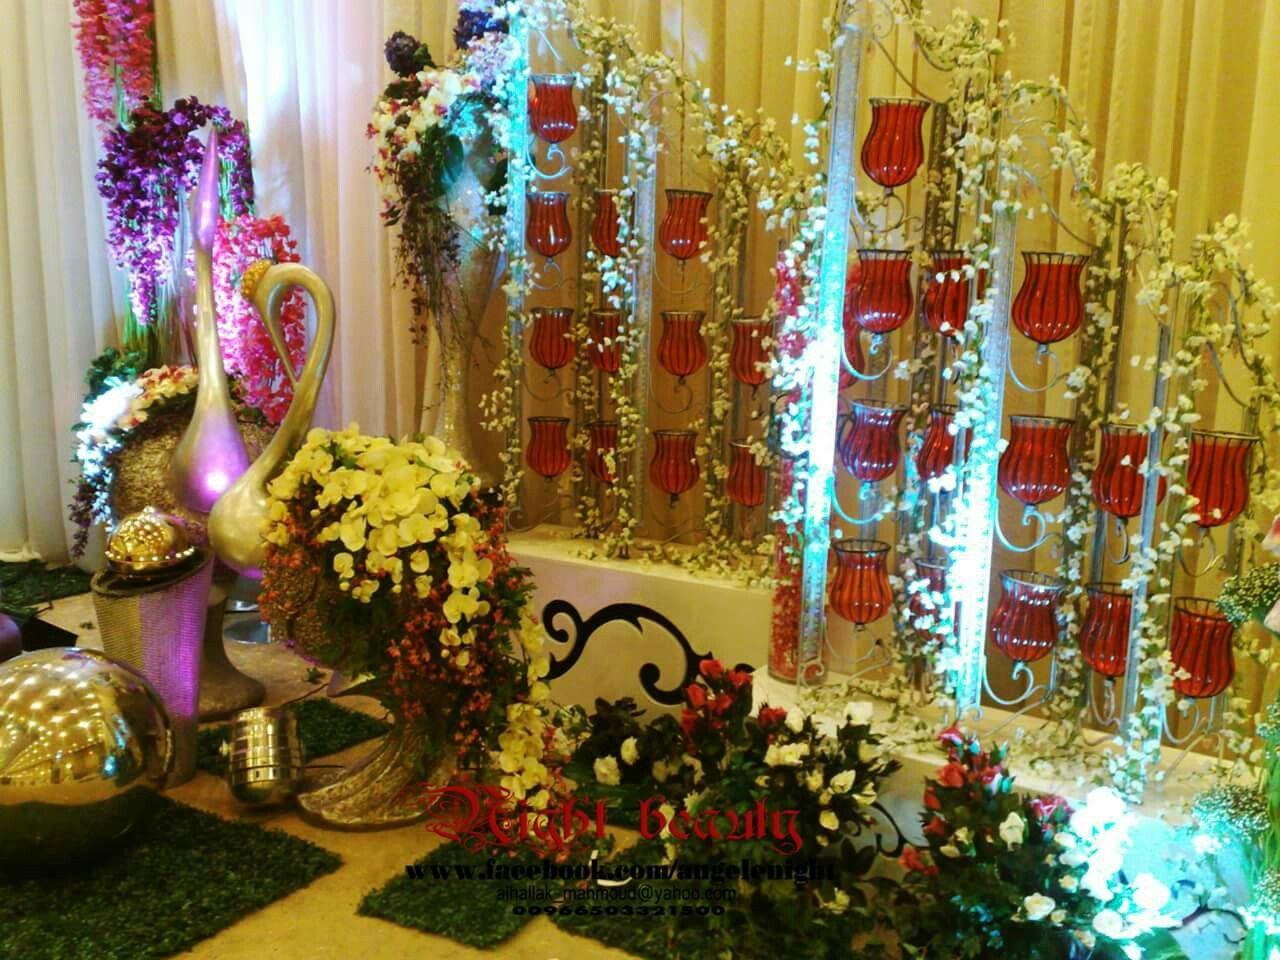 Pin by mahmoud alhalak on my night beauty flowers shop